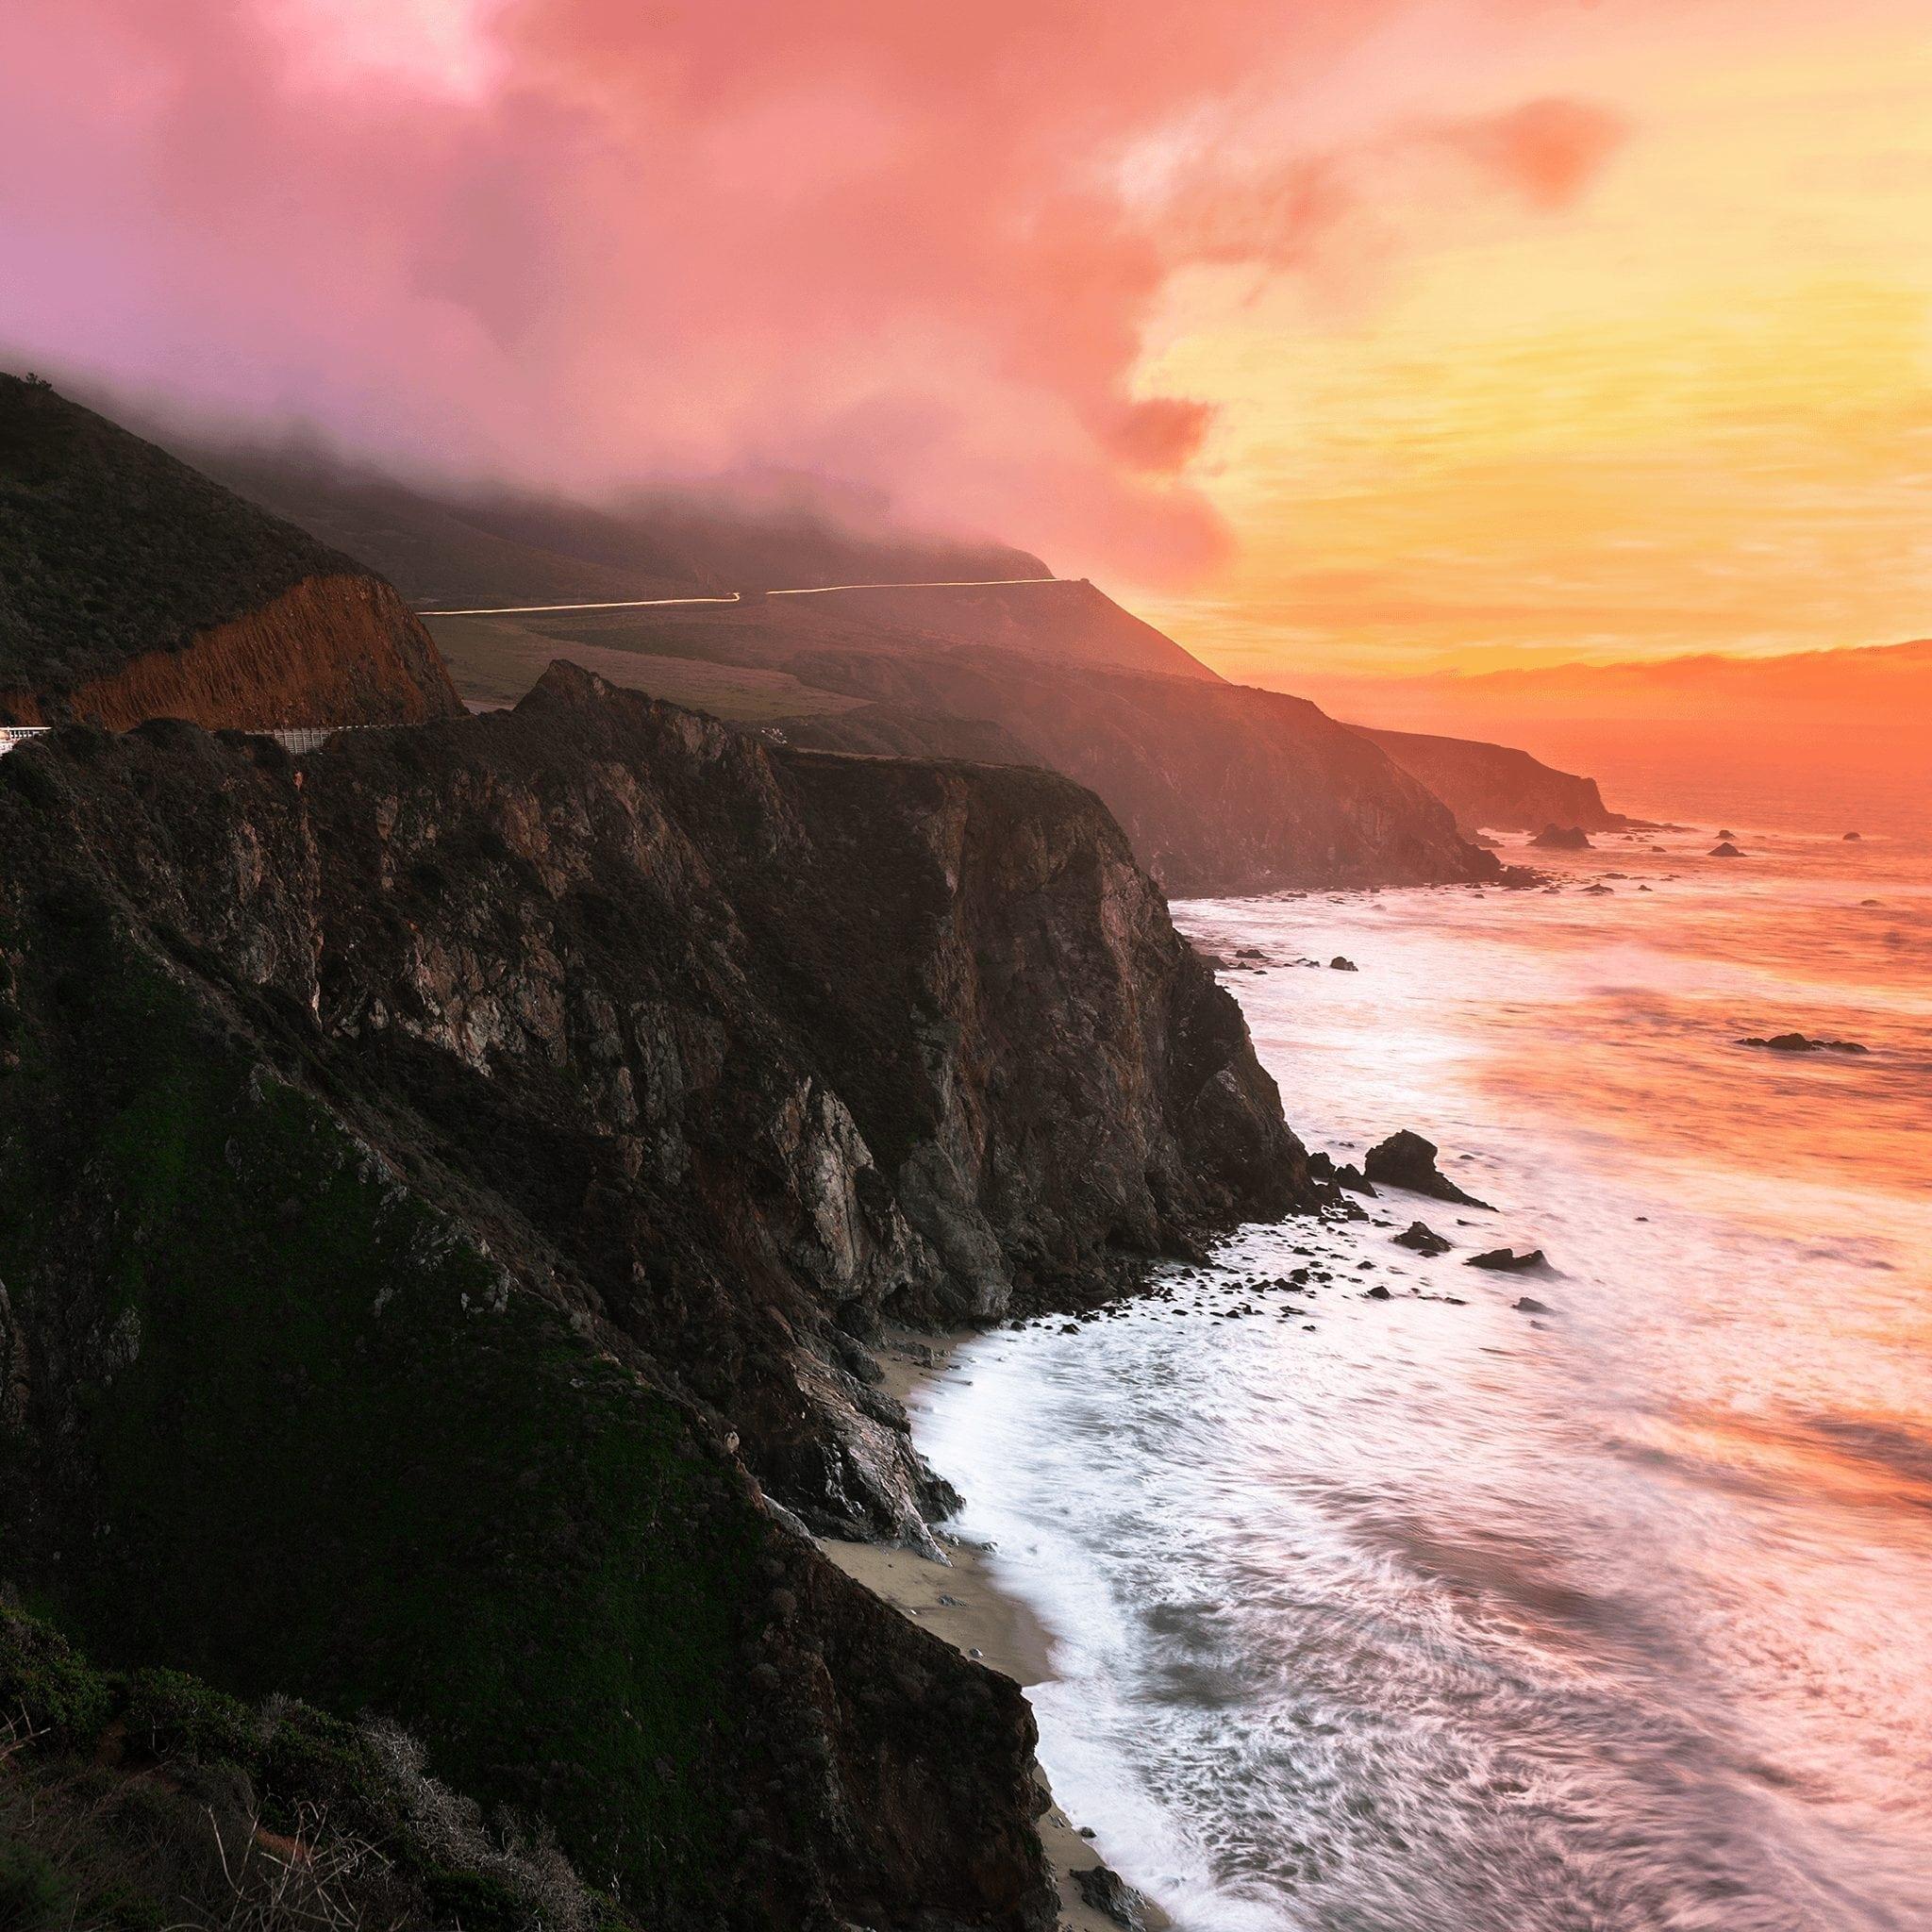 beautiful_wallpapers_ipad_air_2_californiacolors